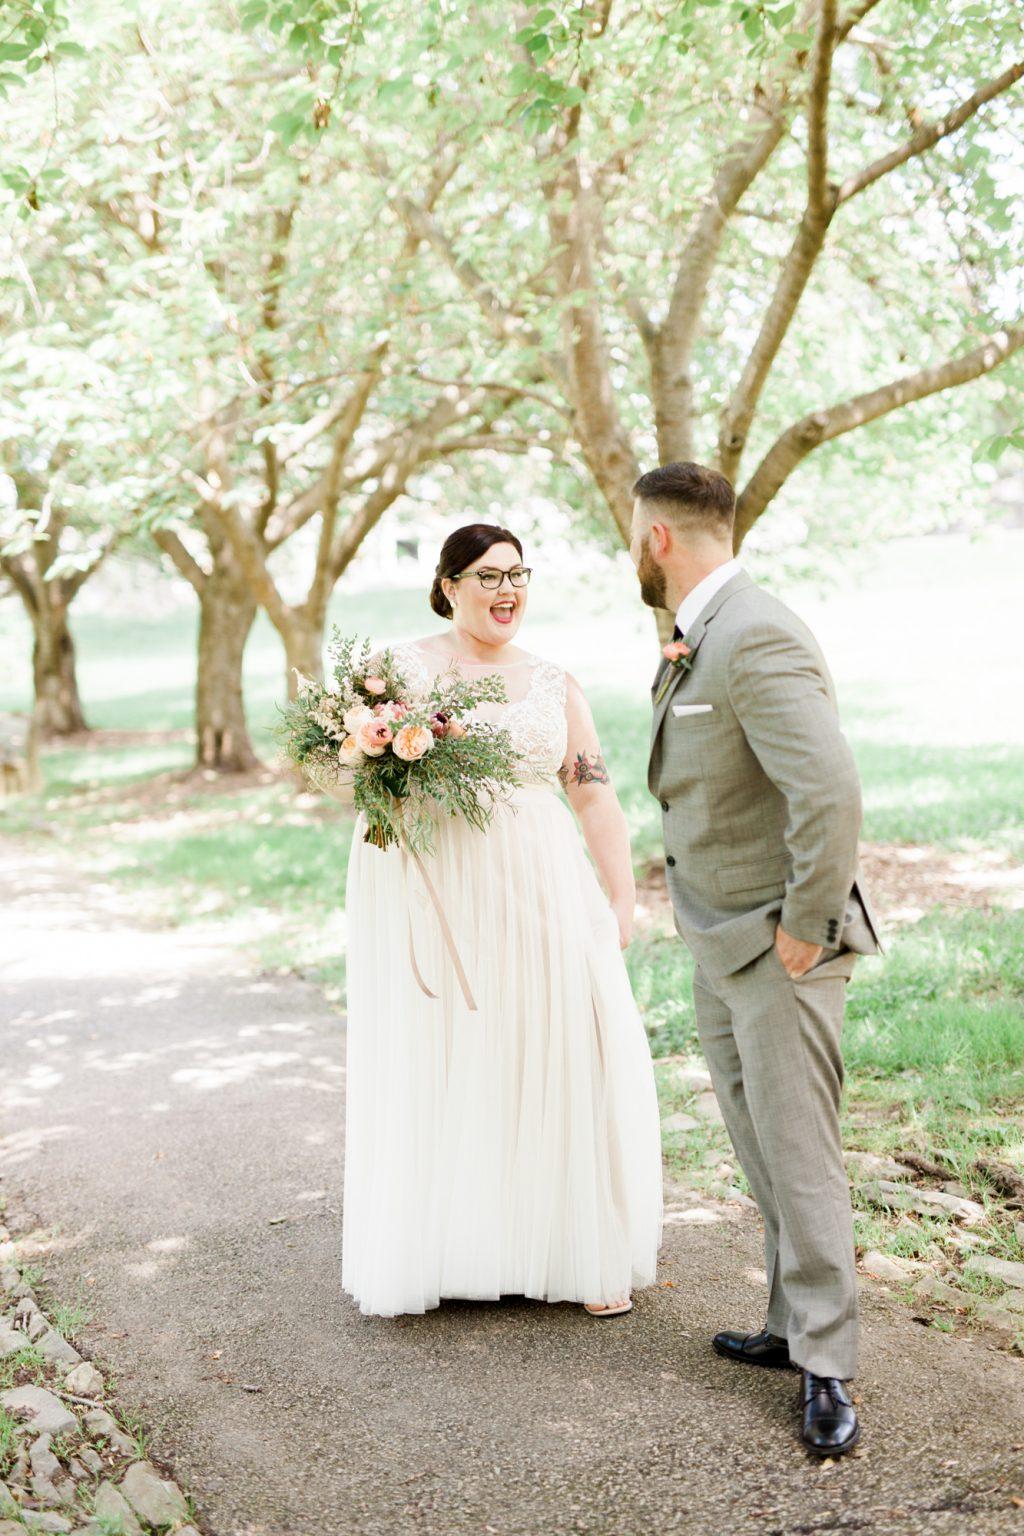 haley-richter-photo-west-chester-summer-wedding-boxcar-brewery-032